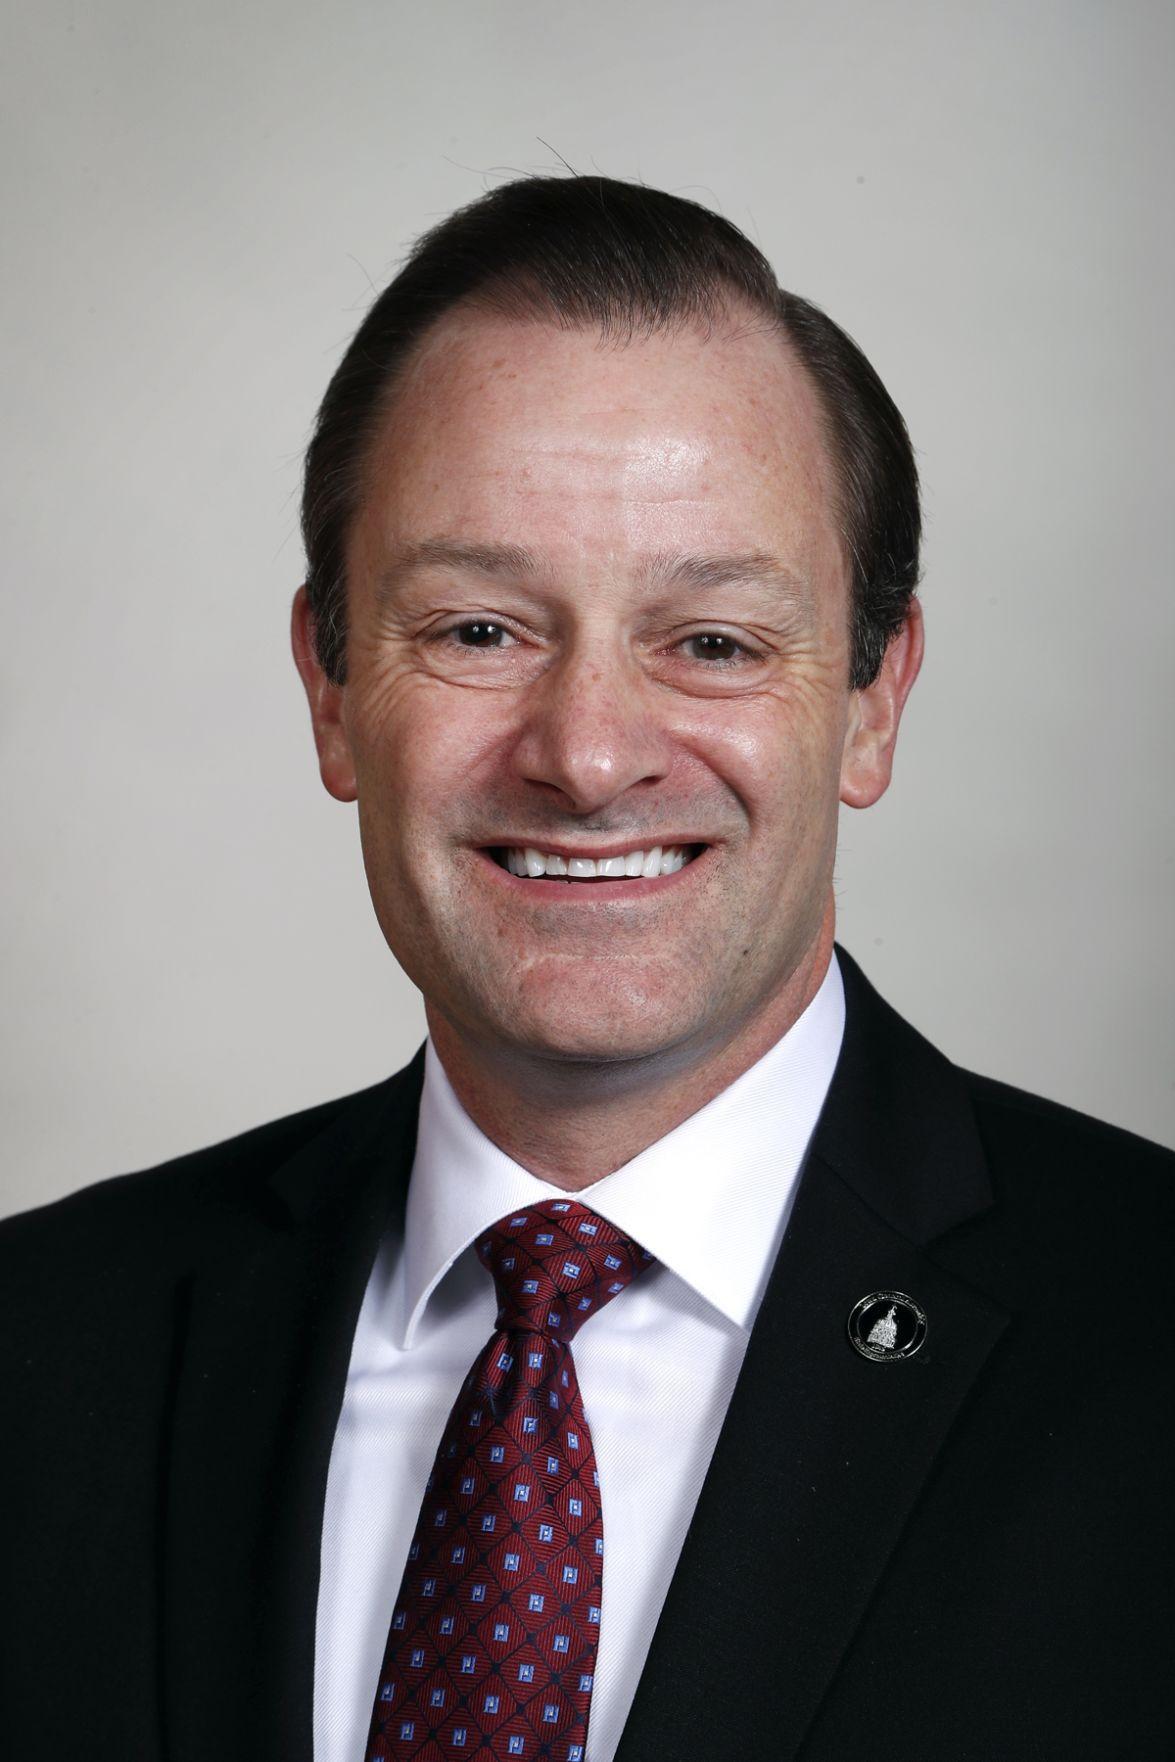 Iowa state Rep. Ken Rizer